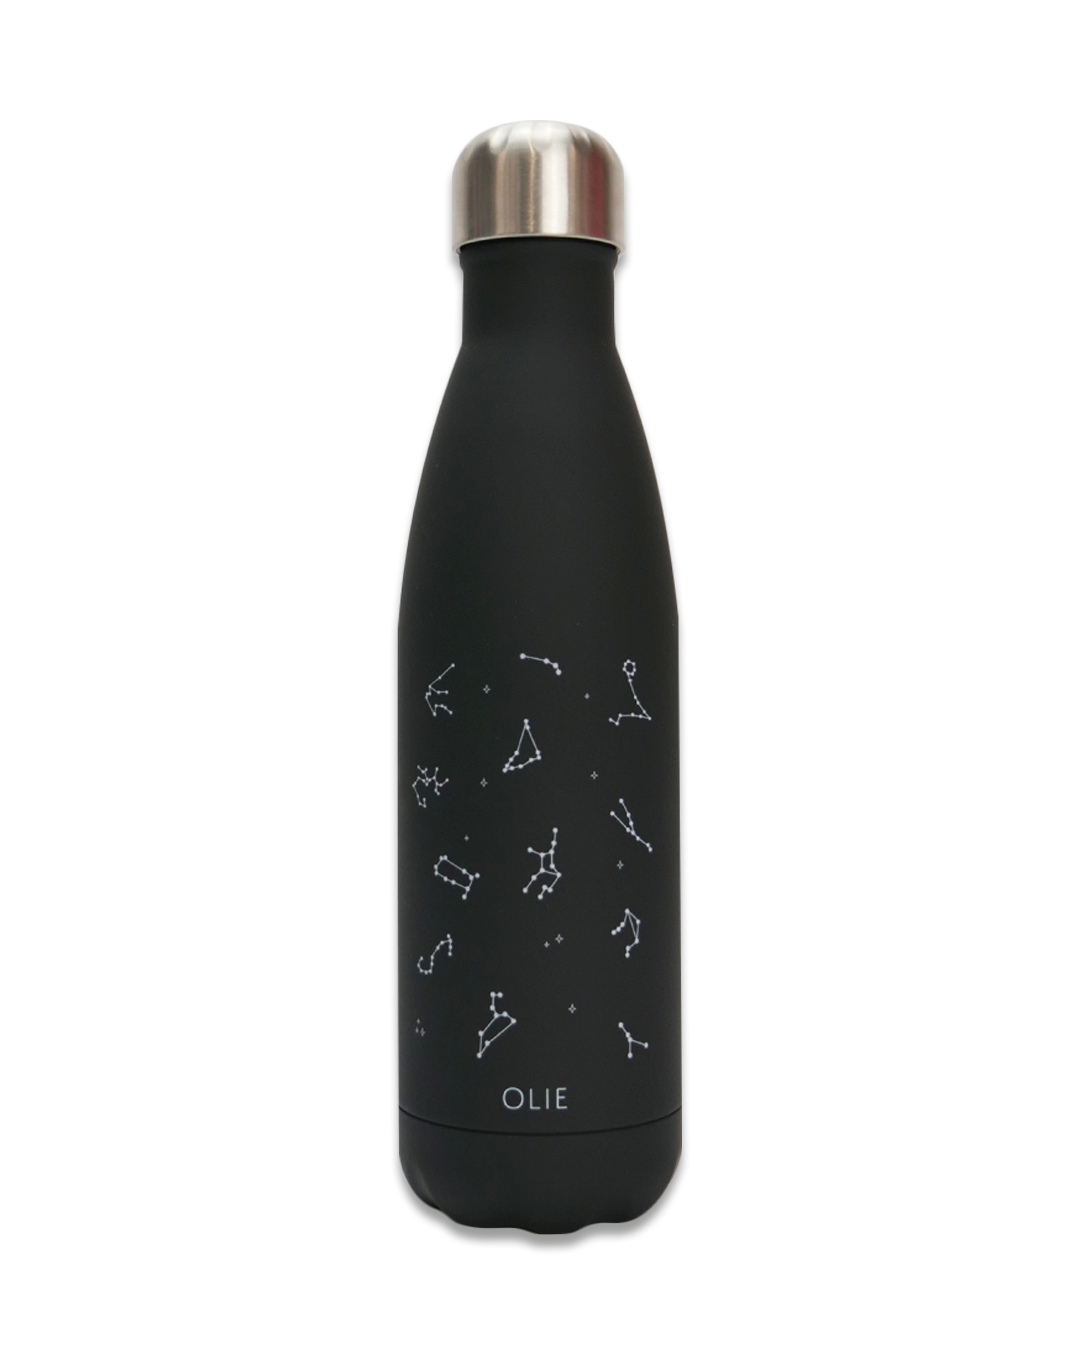 Black Zodiac bottle